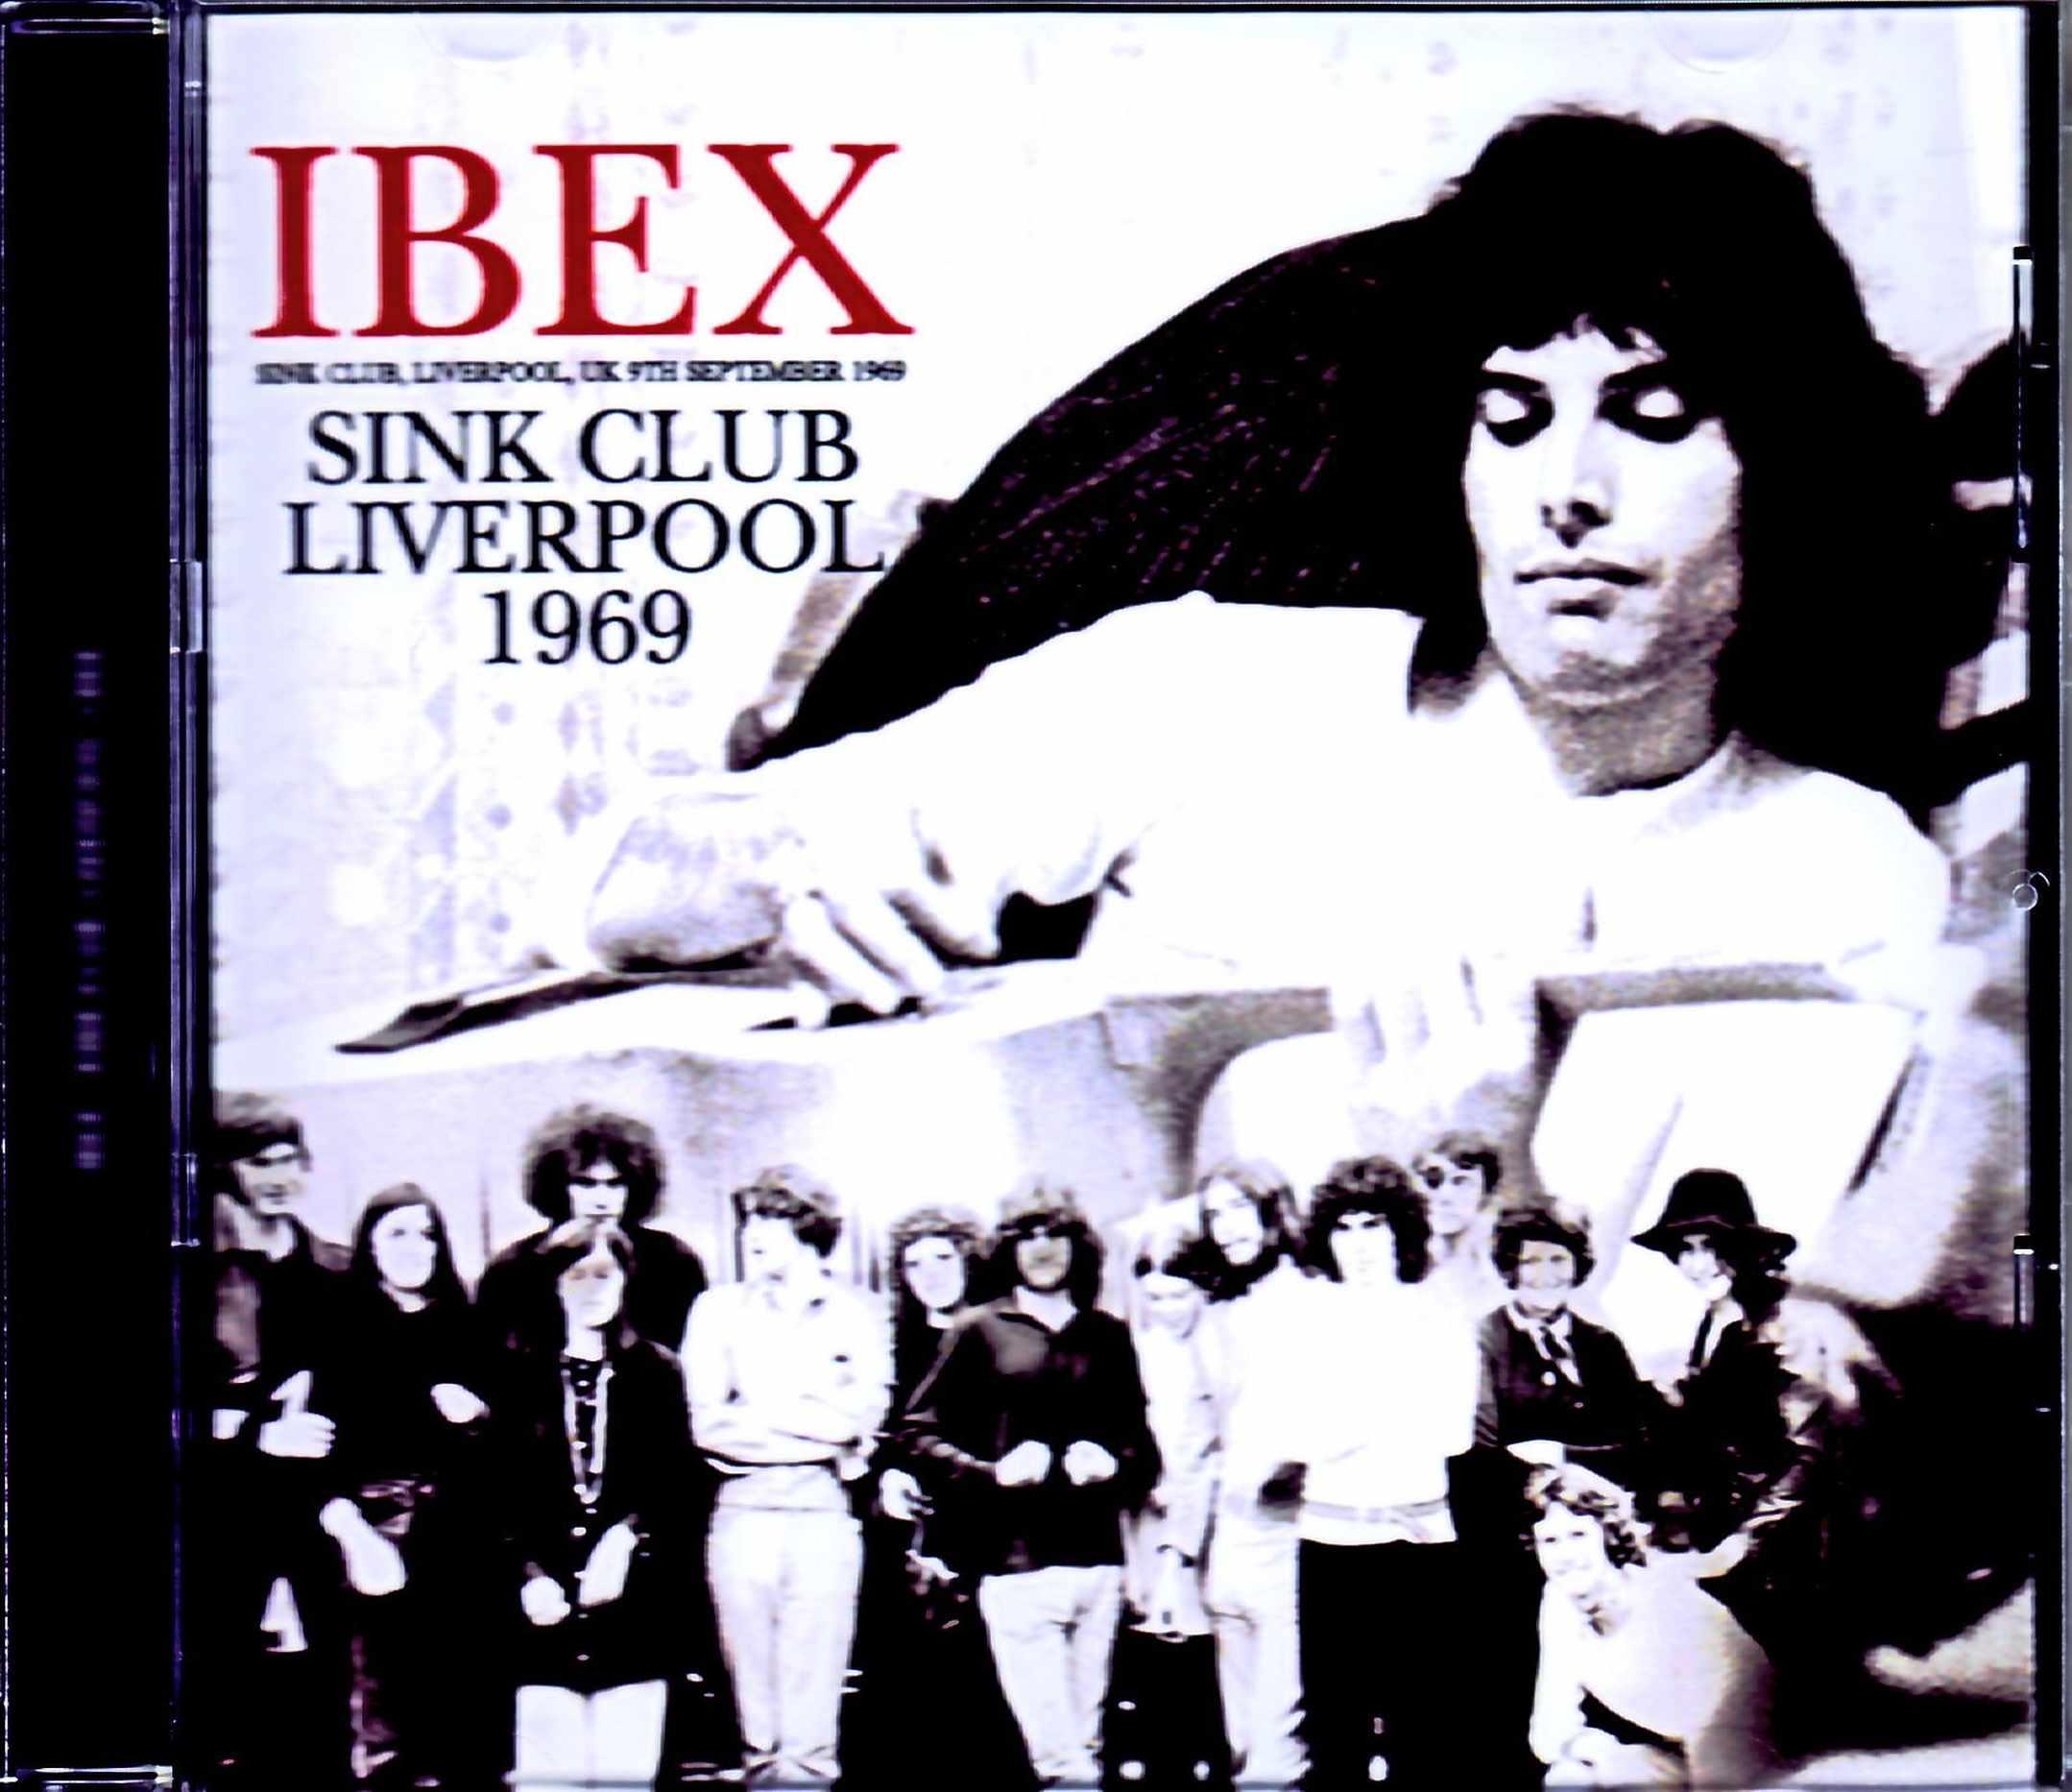 IBEX Freddie Bulsara/フレディ・マーキュリーがQUEEN以前に在籍していた幻のバンド UK 1969 Upgrade